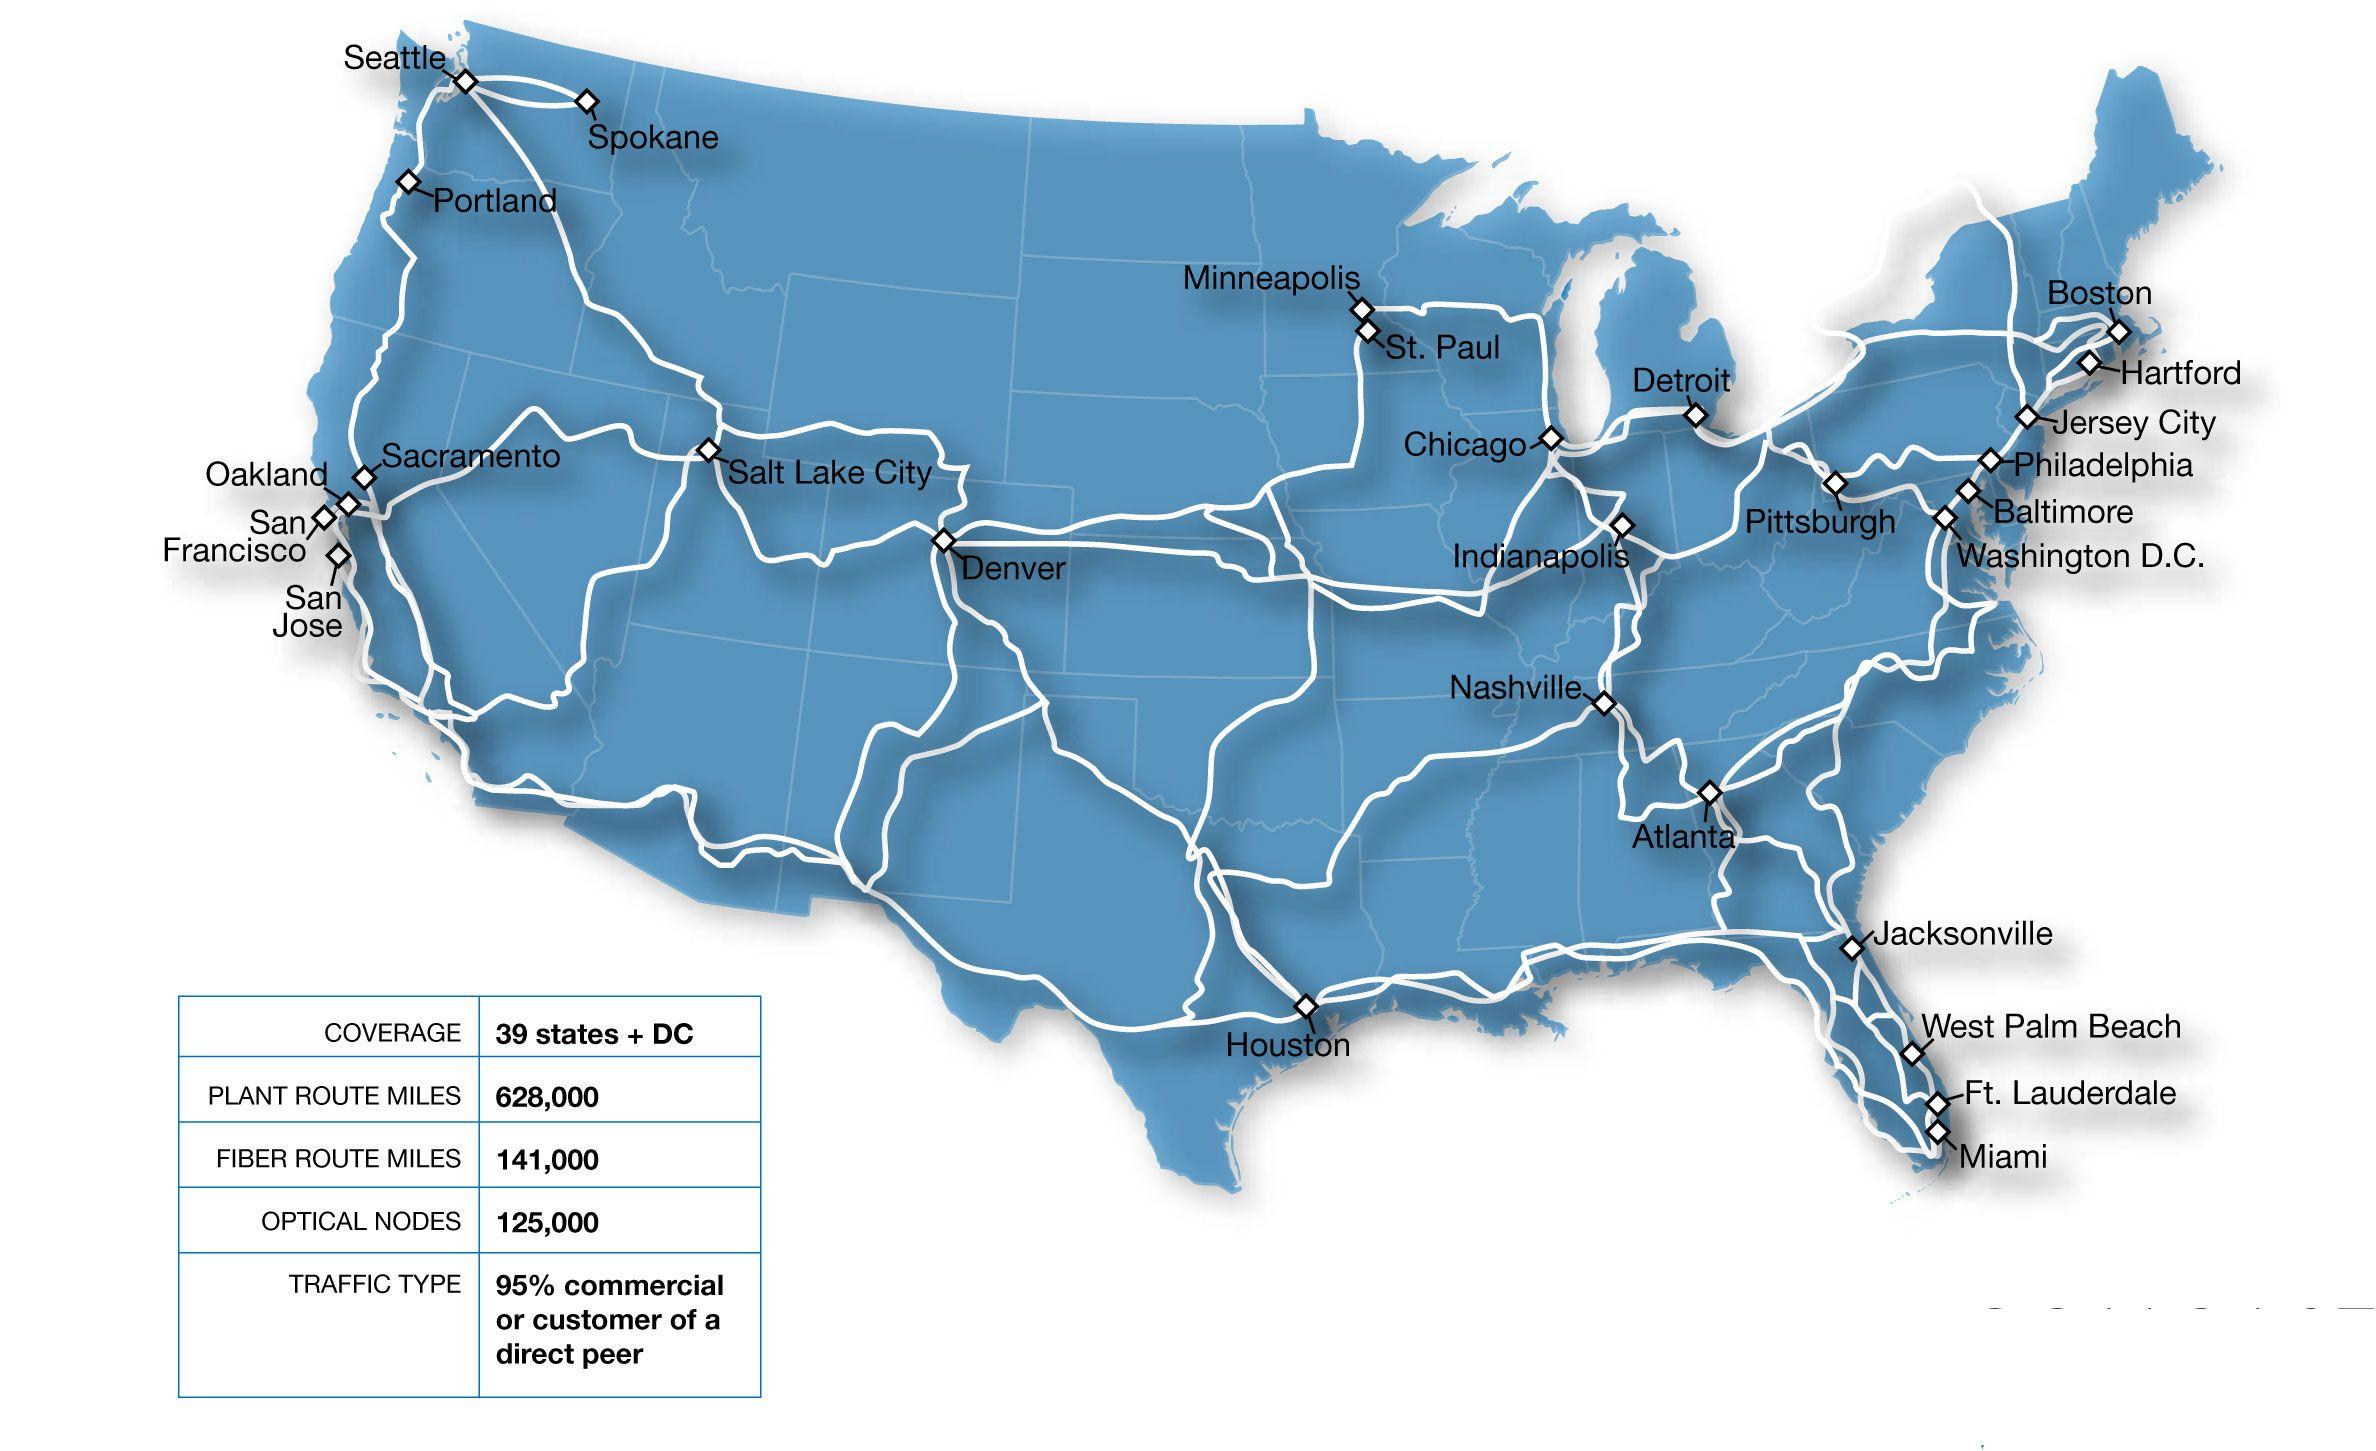 Comcast Fiber Map My Blog - Us fiber map